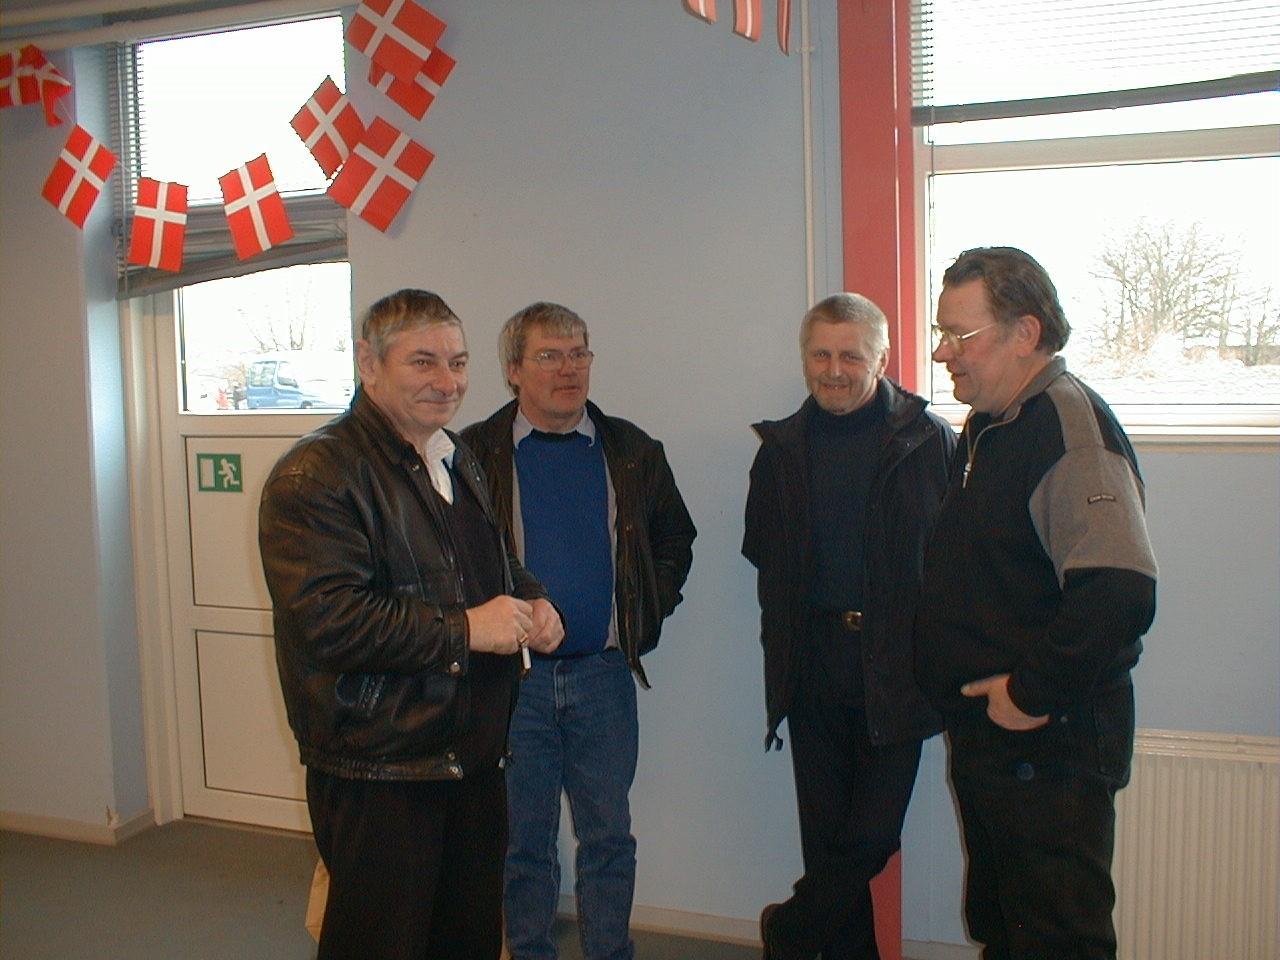 Service, Mini, Jørgen Svendsen og Jens Jørgen Jørgensen.